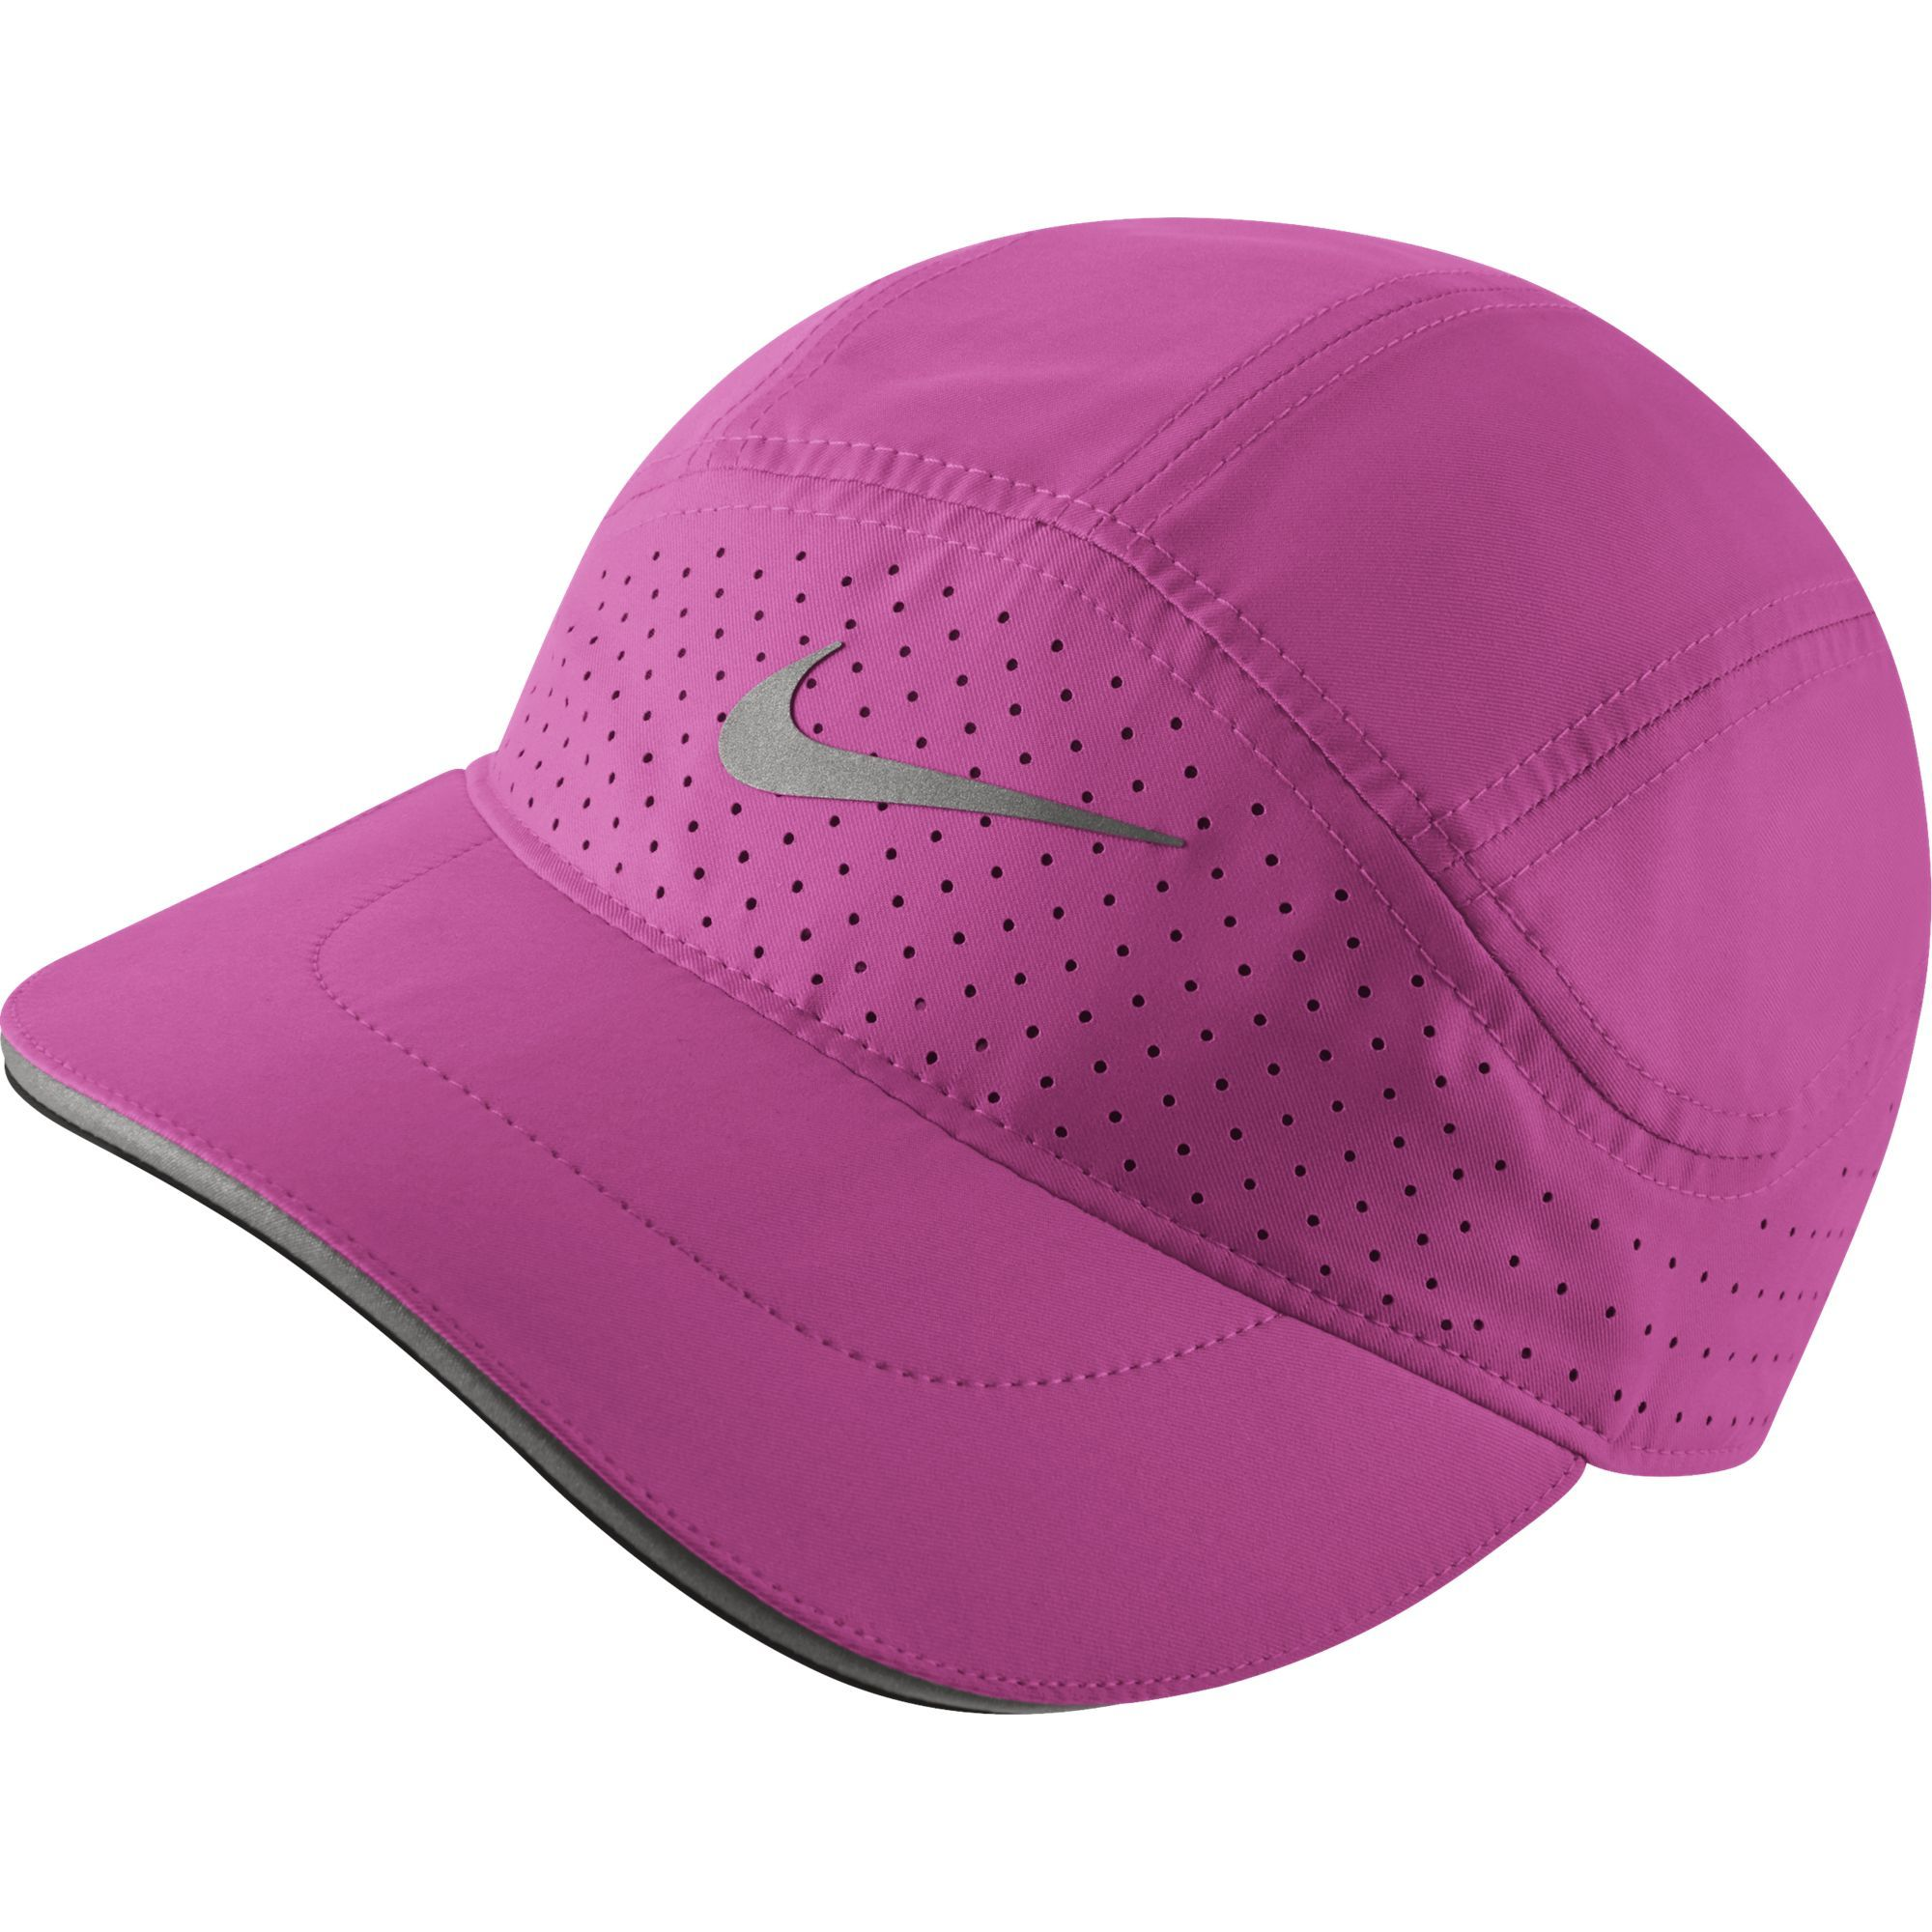 Nike Lady Aerobill Tailwind Elite Cap (Pink)